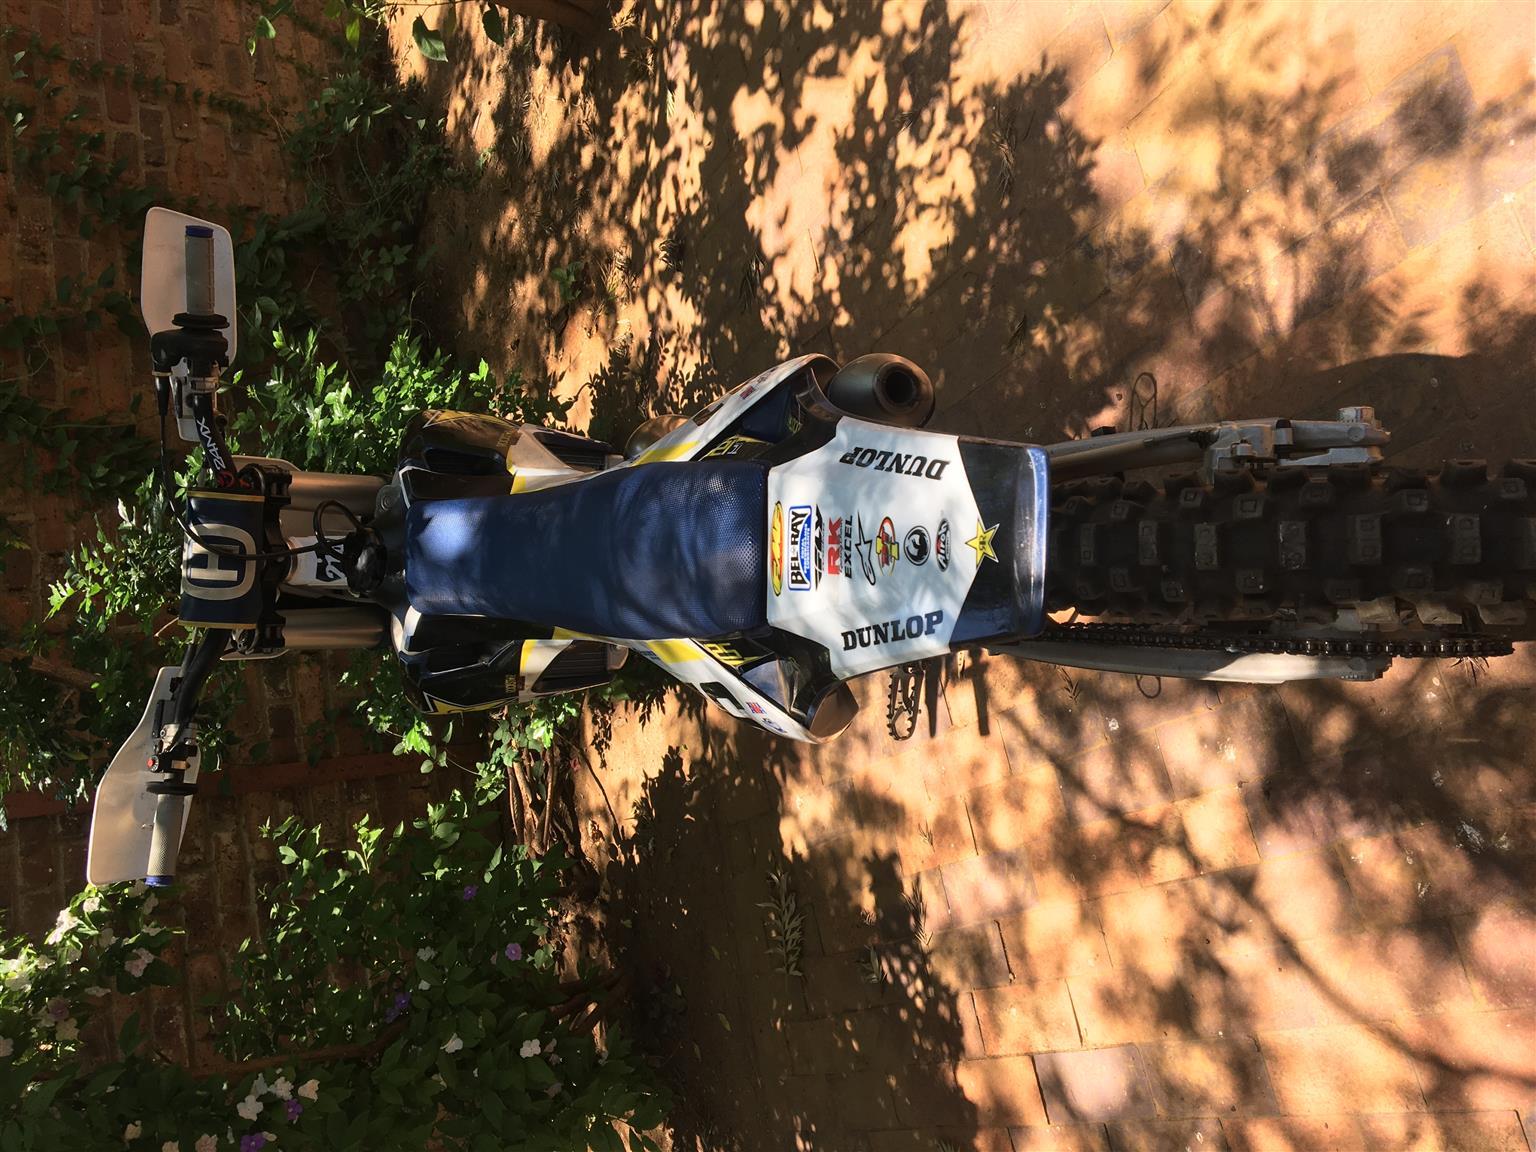 2016 Husqvarna TC 125 Motocross